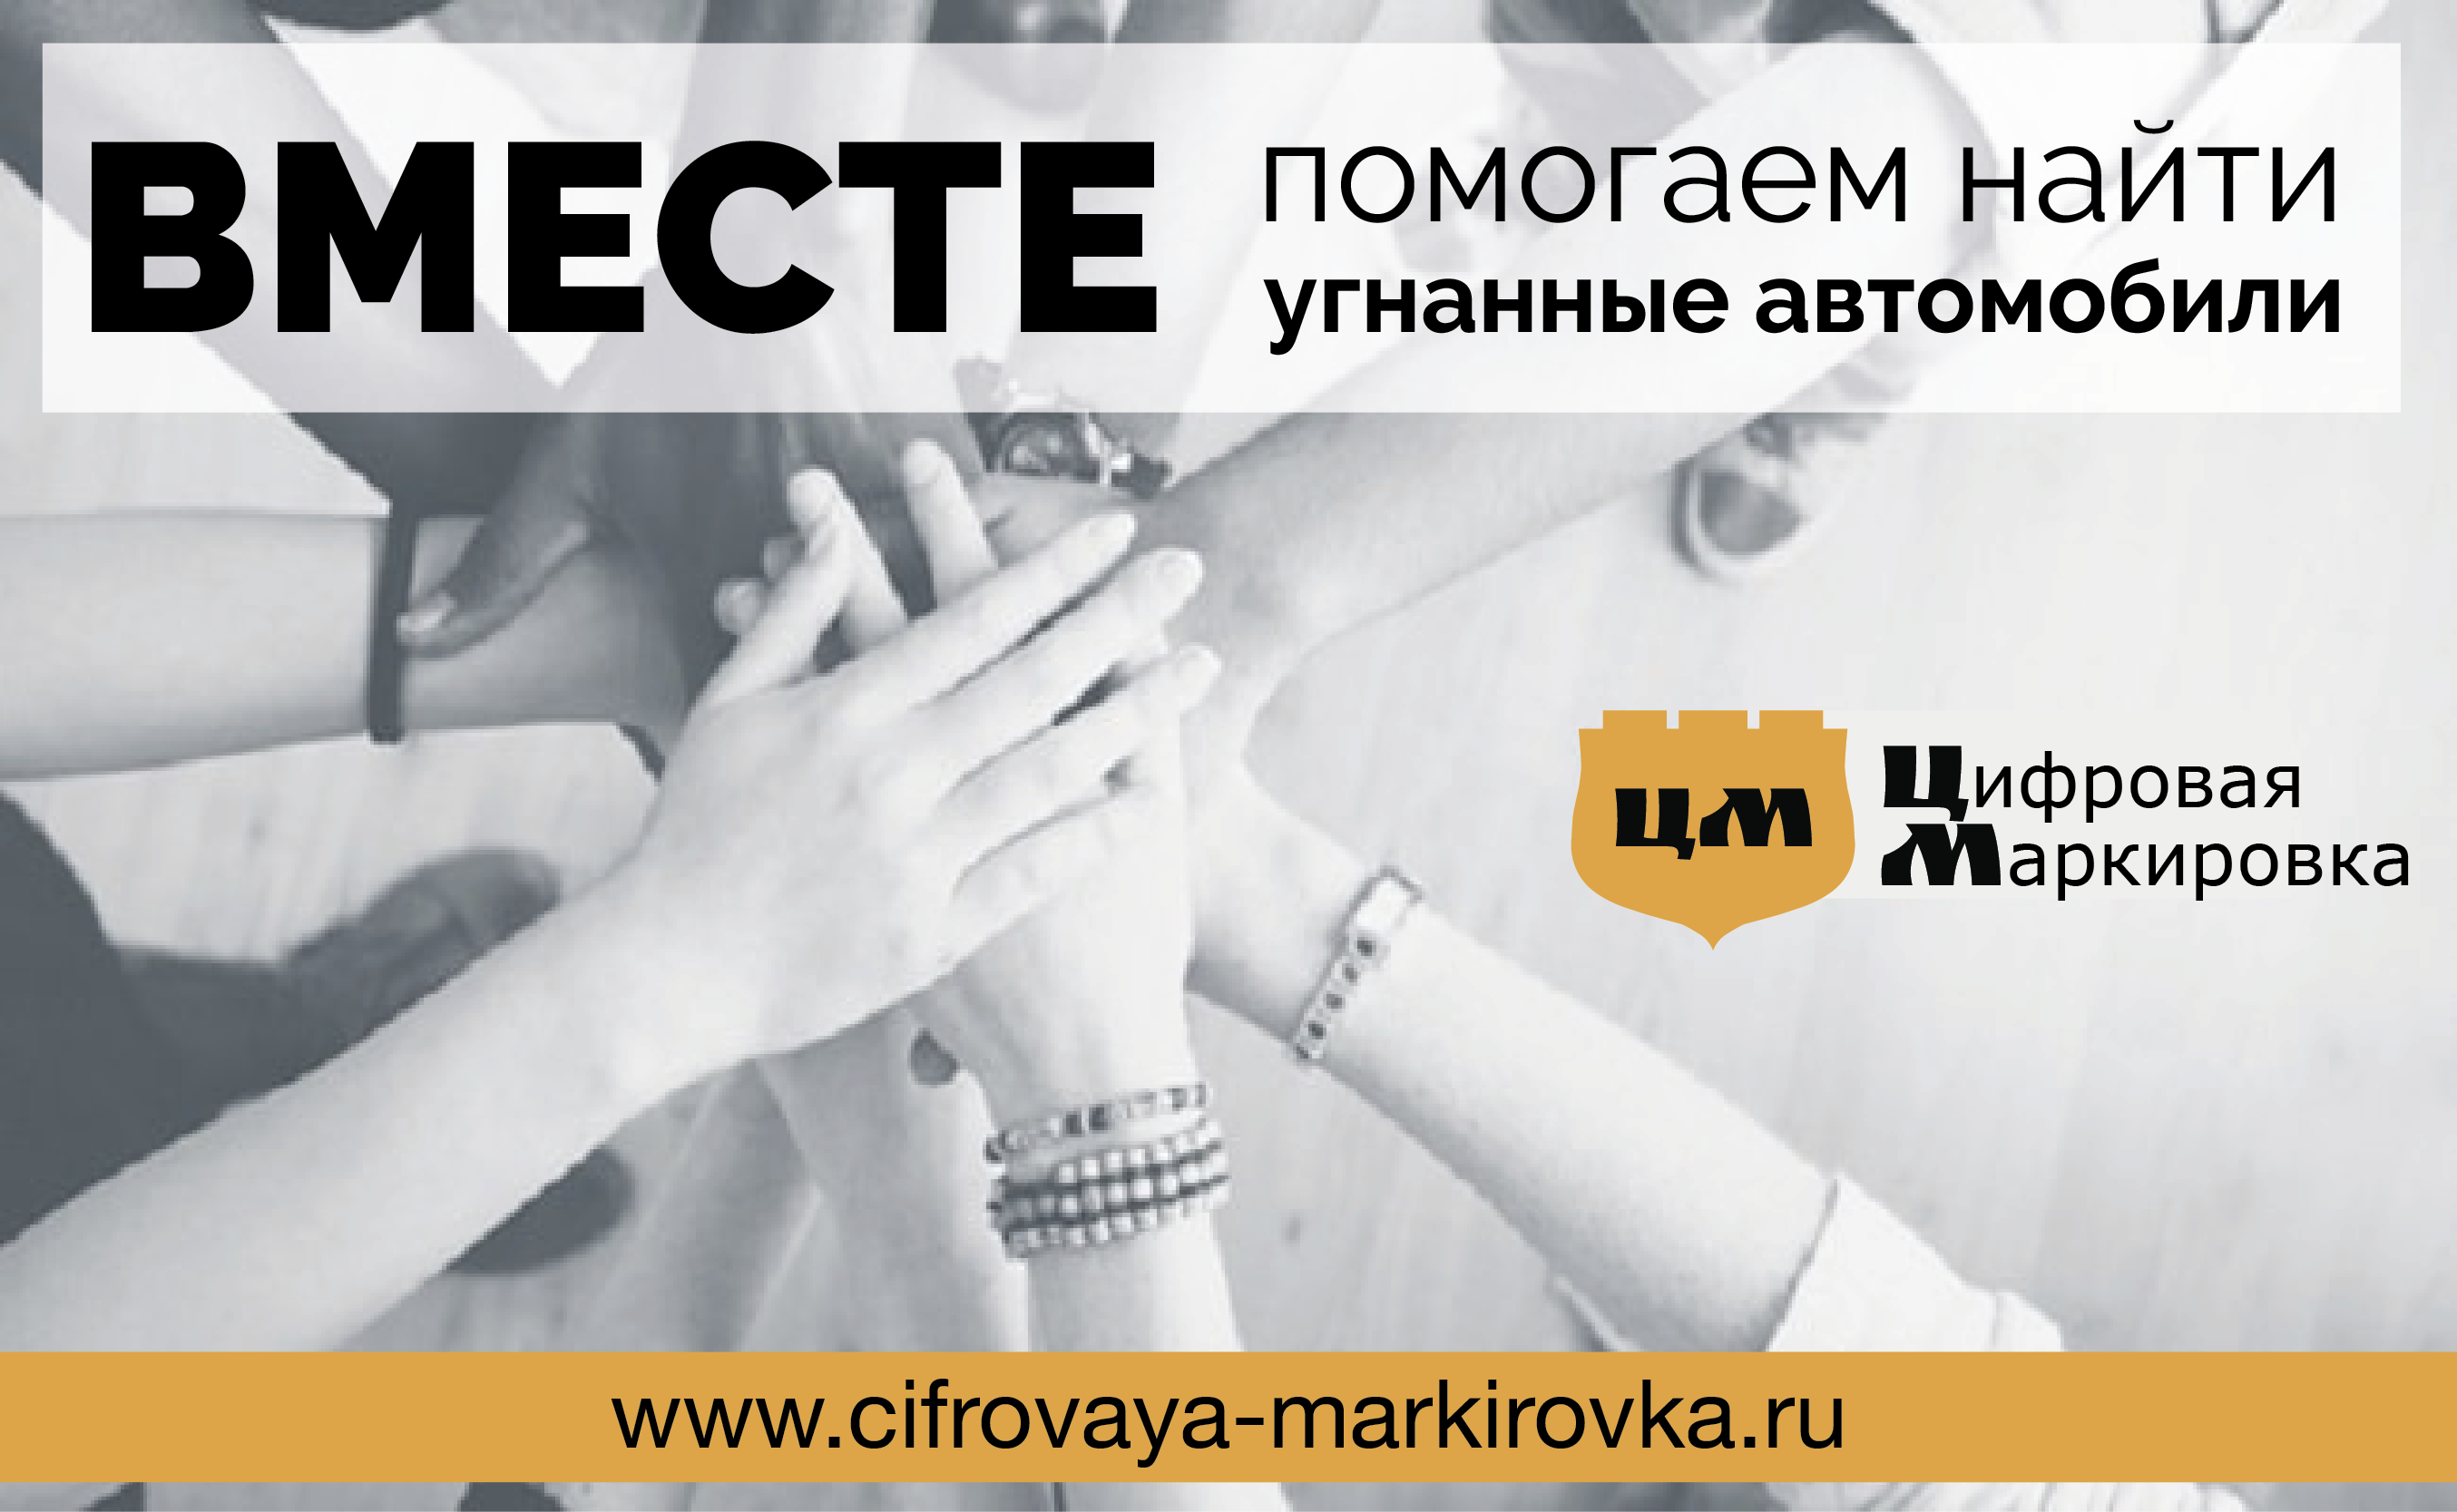 cifrovaya-markirovka-7